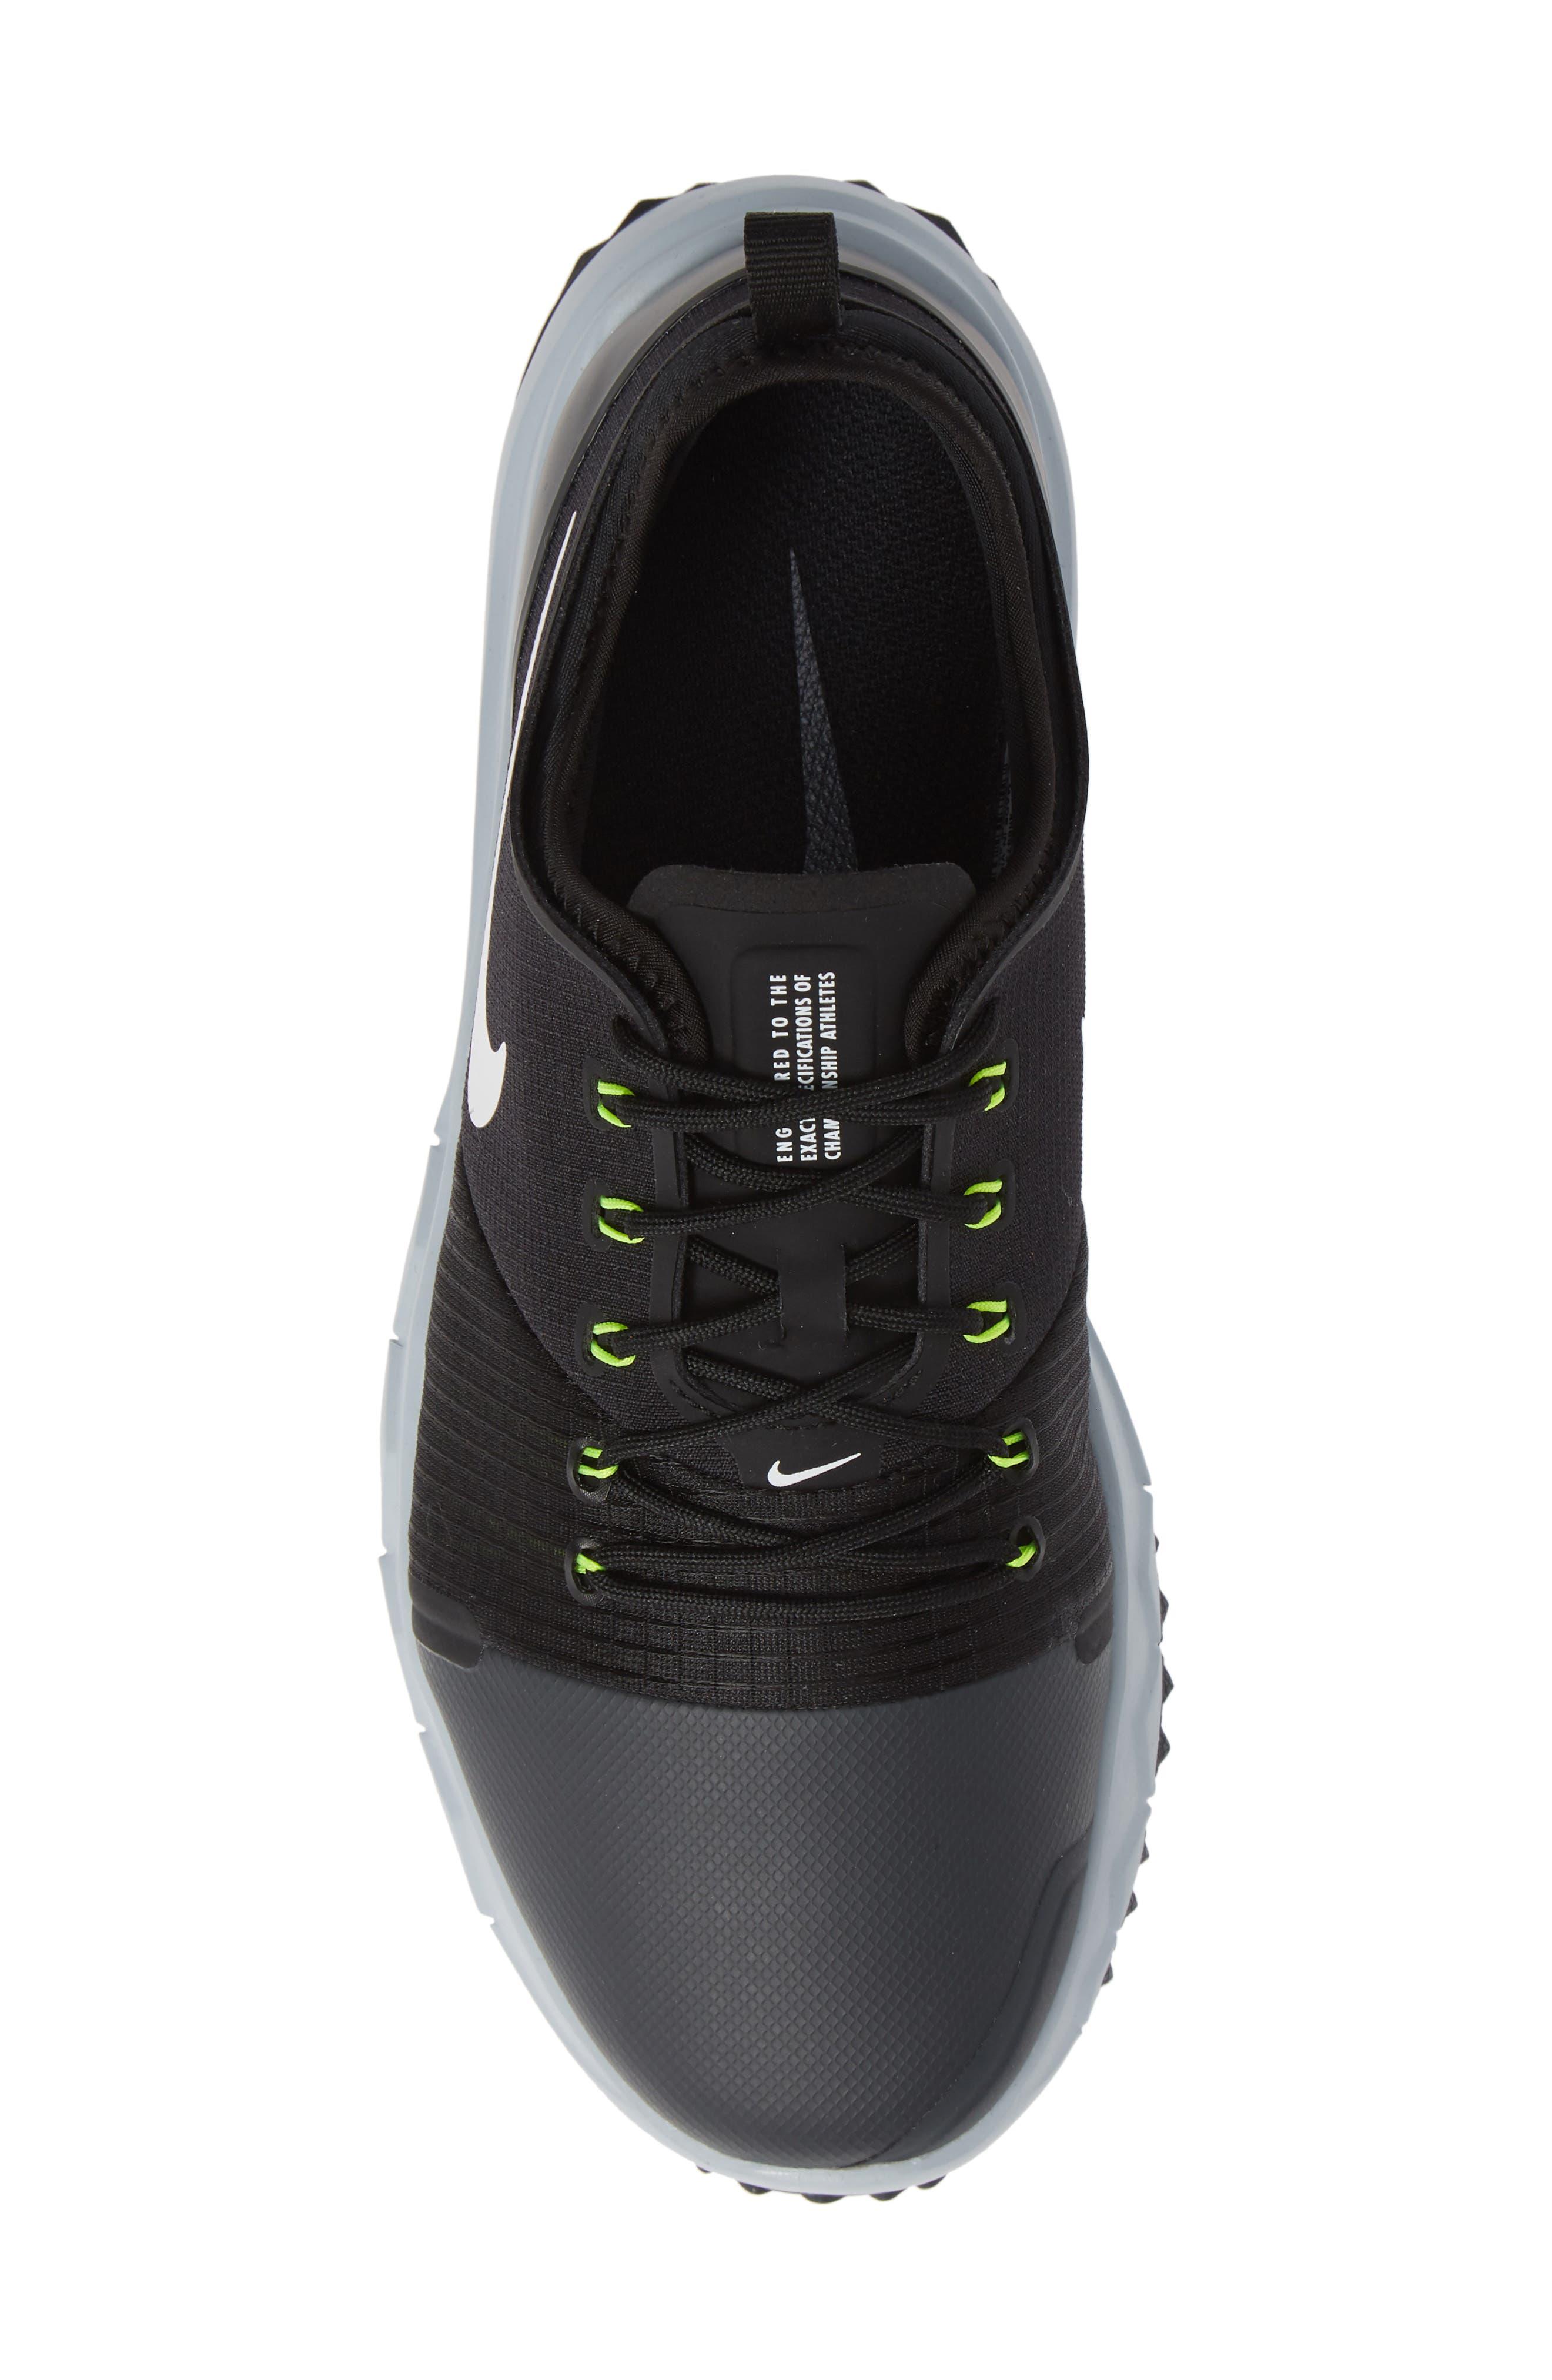 FI Impact 3 Waterproof Golf Shoe,                             Alternate thumbnail 5, color,                             ANTHRACITE/ WHITE/ BLACK/ GREY